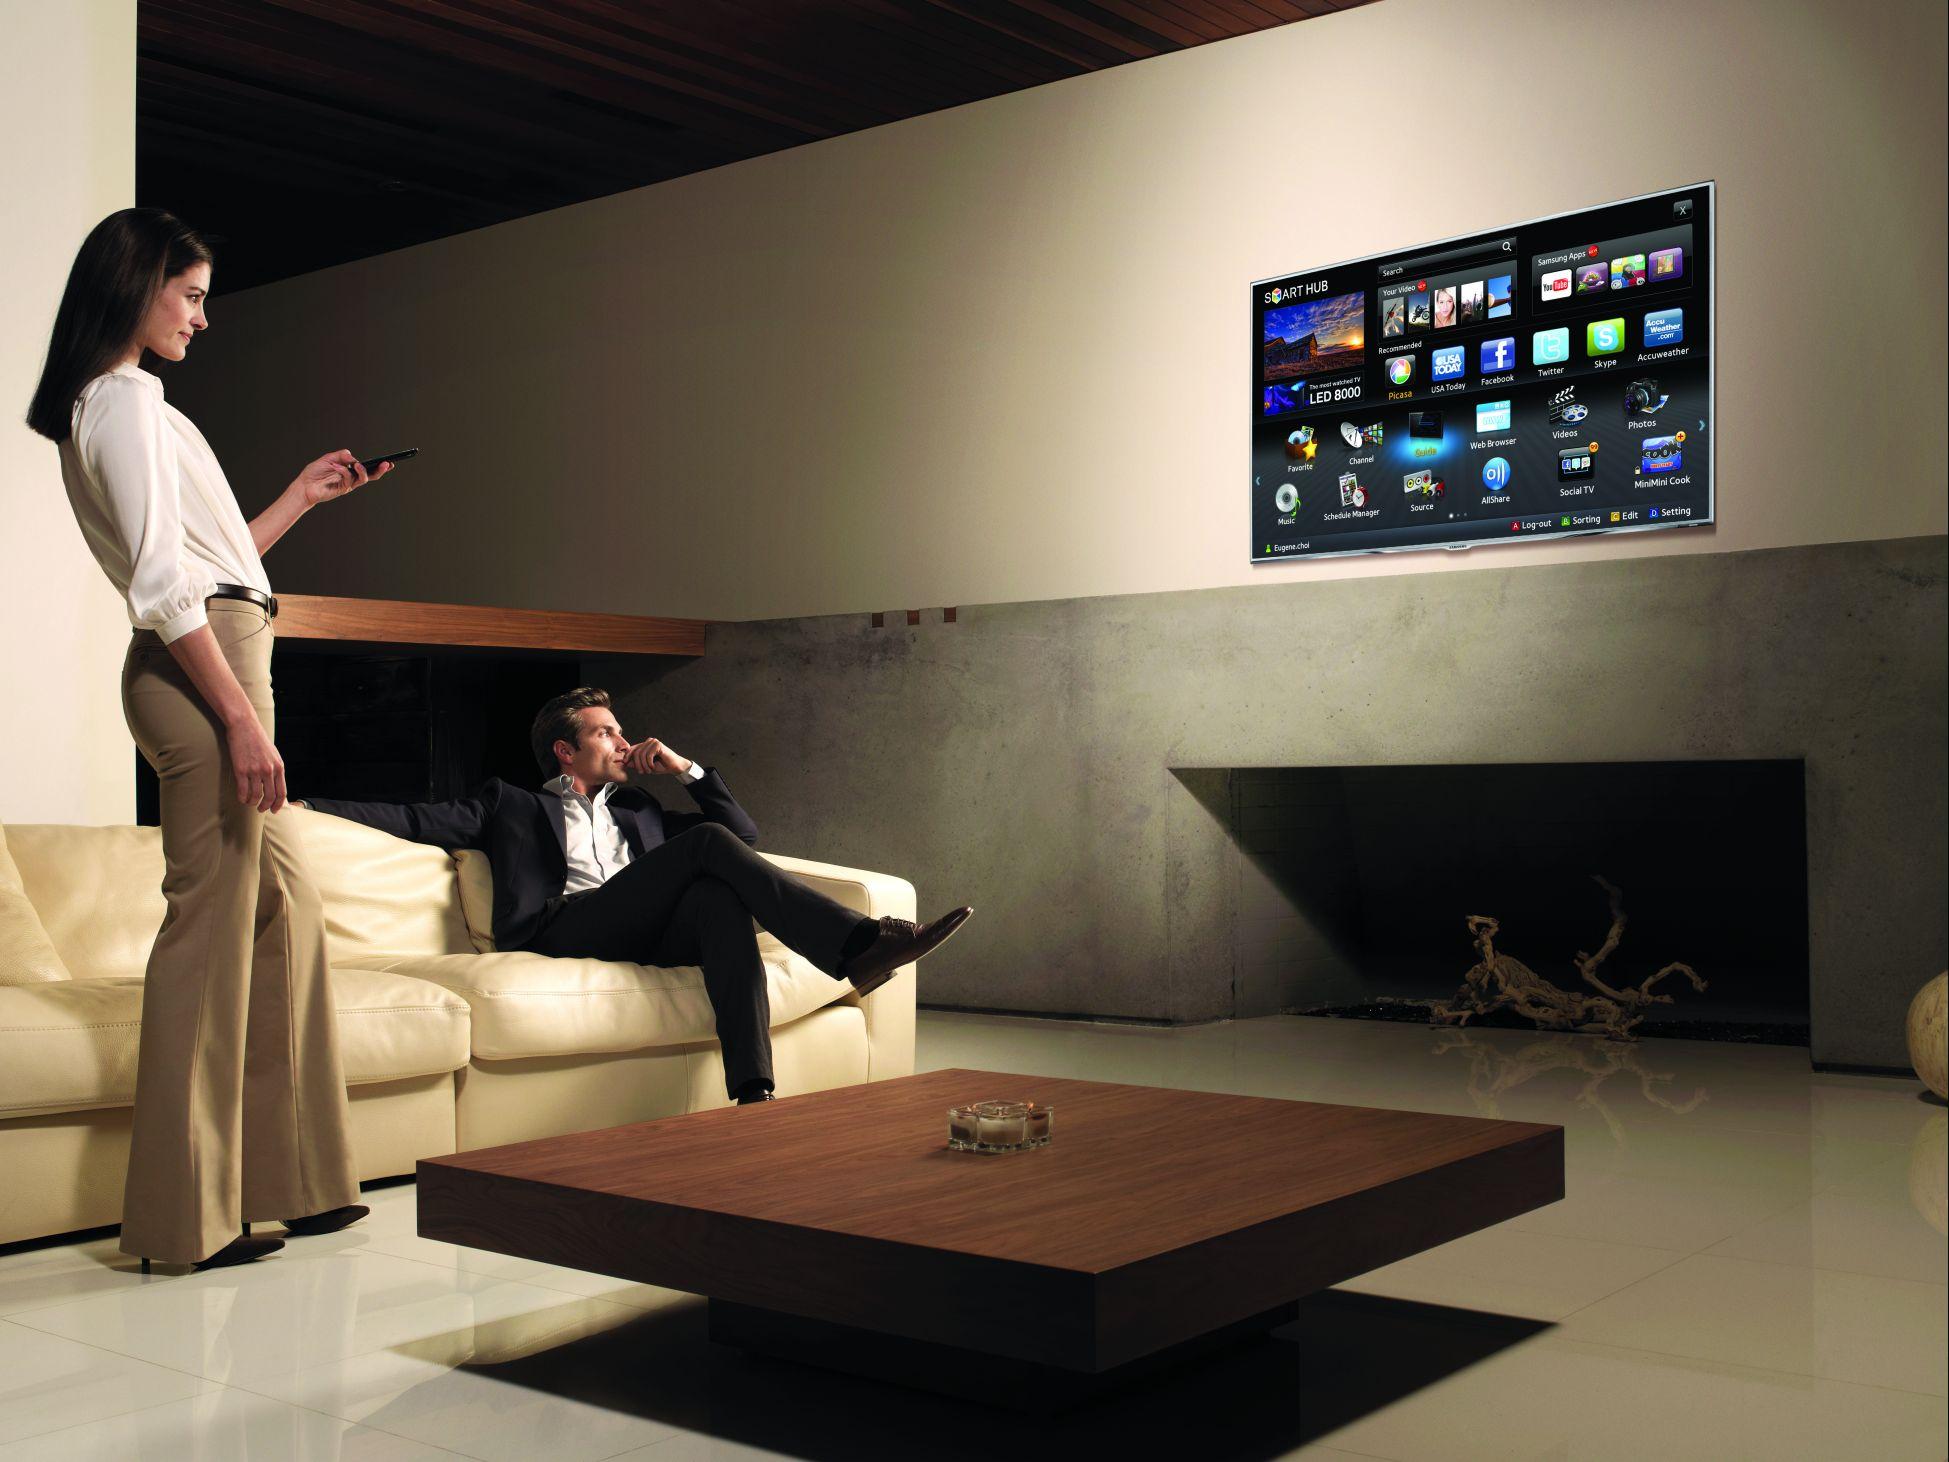 Топ5 телевизоров лета 2017 - смотрим телевизор